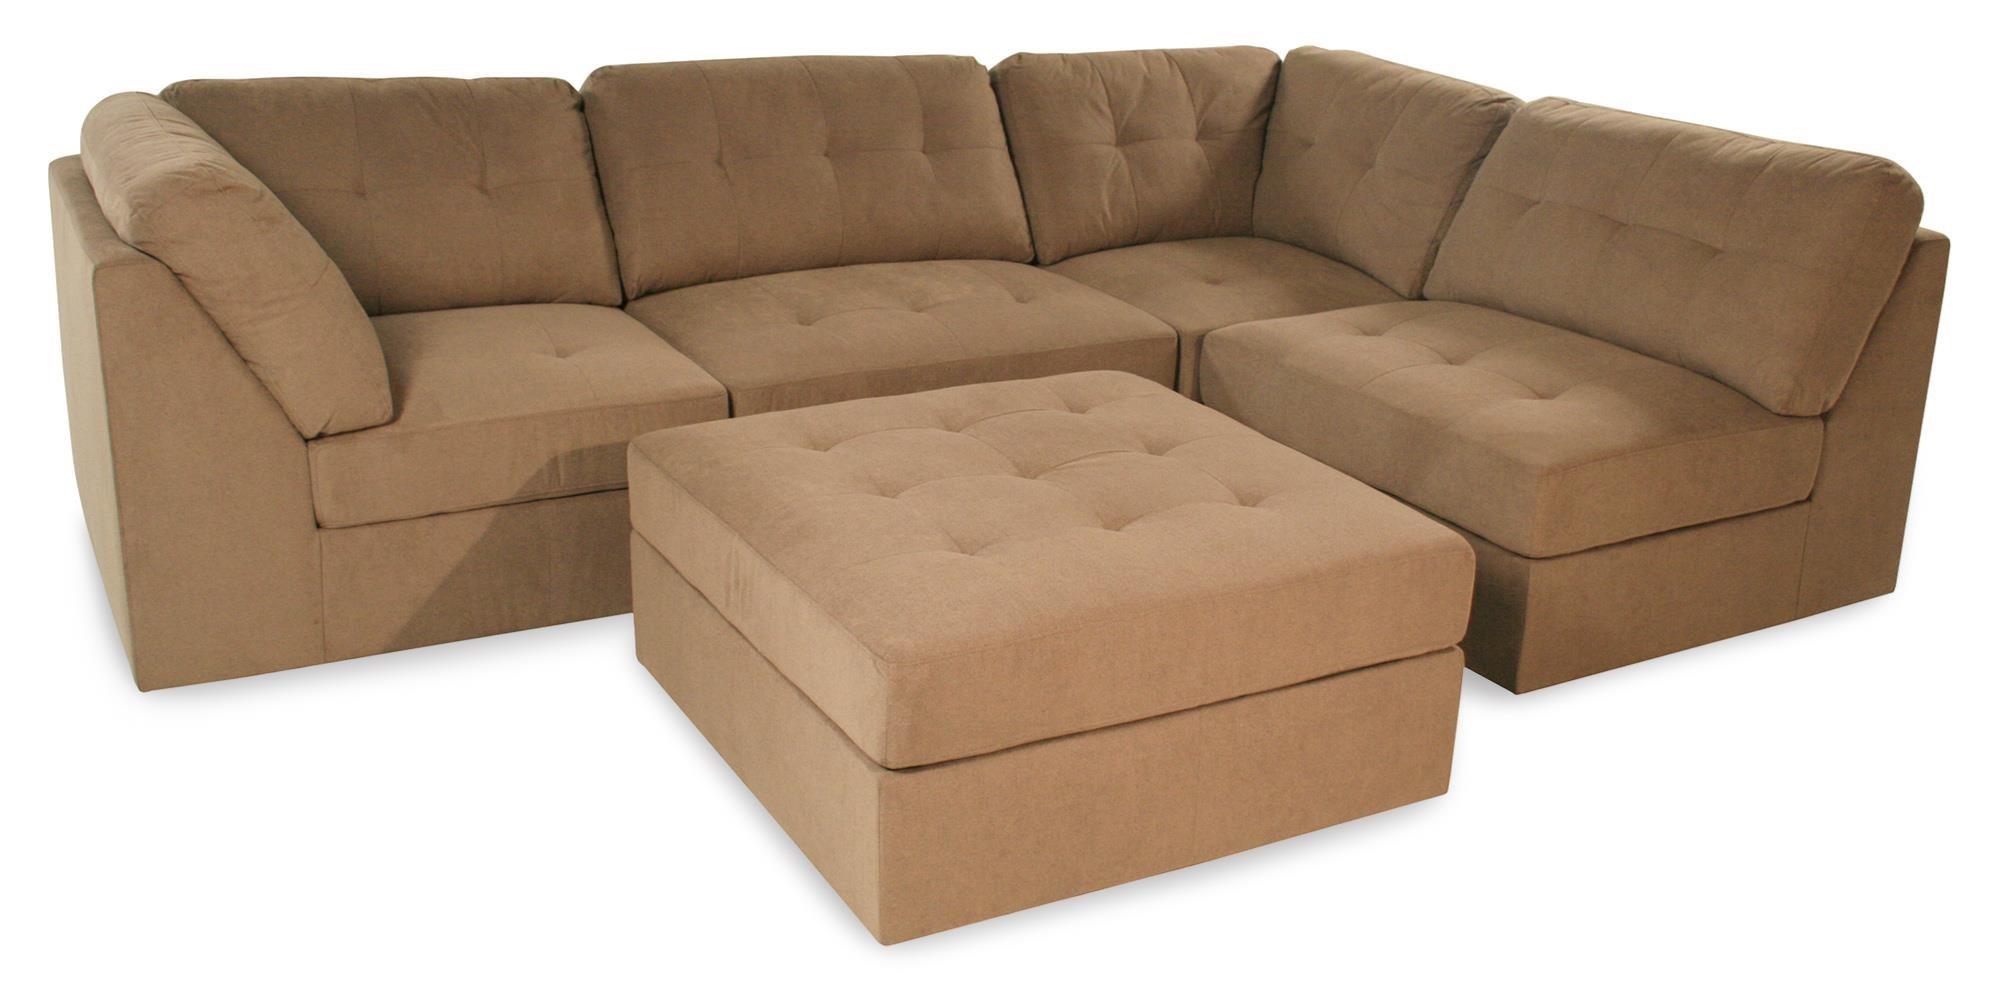 sabrina sofa sectional ottoman set taupe button tufted rotmans